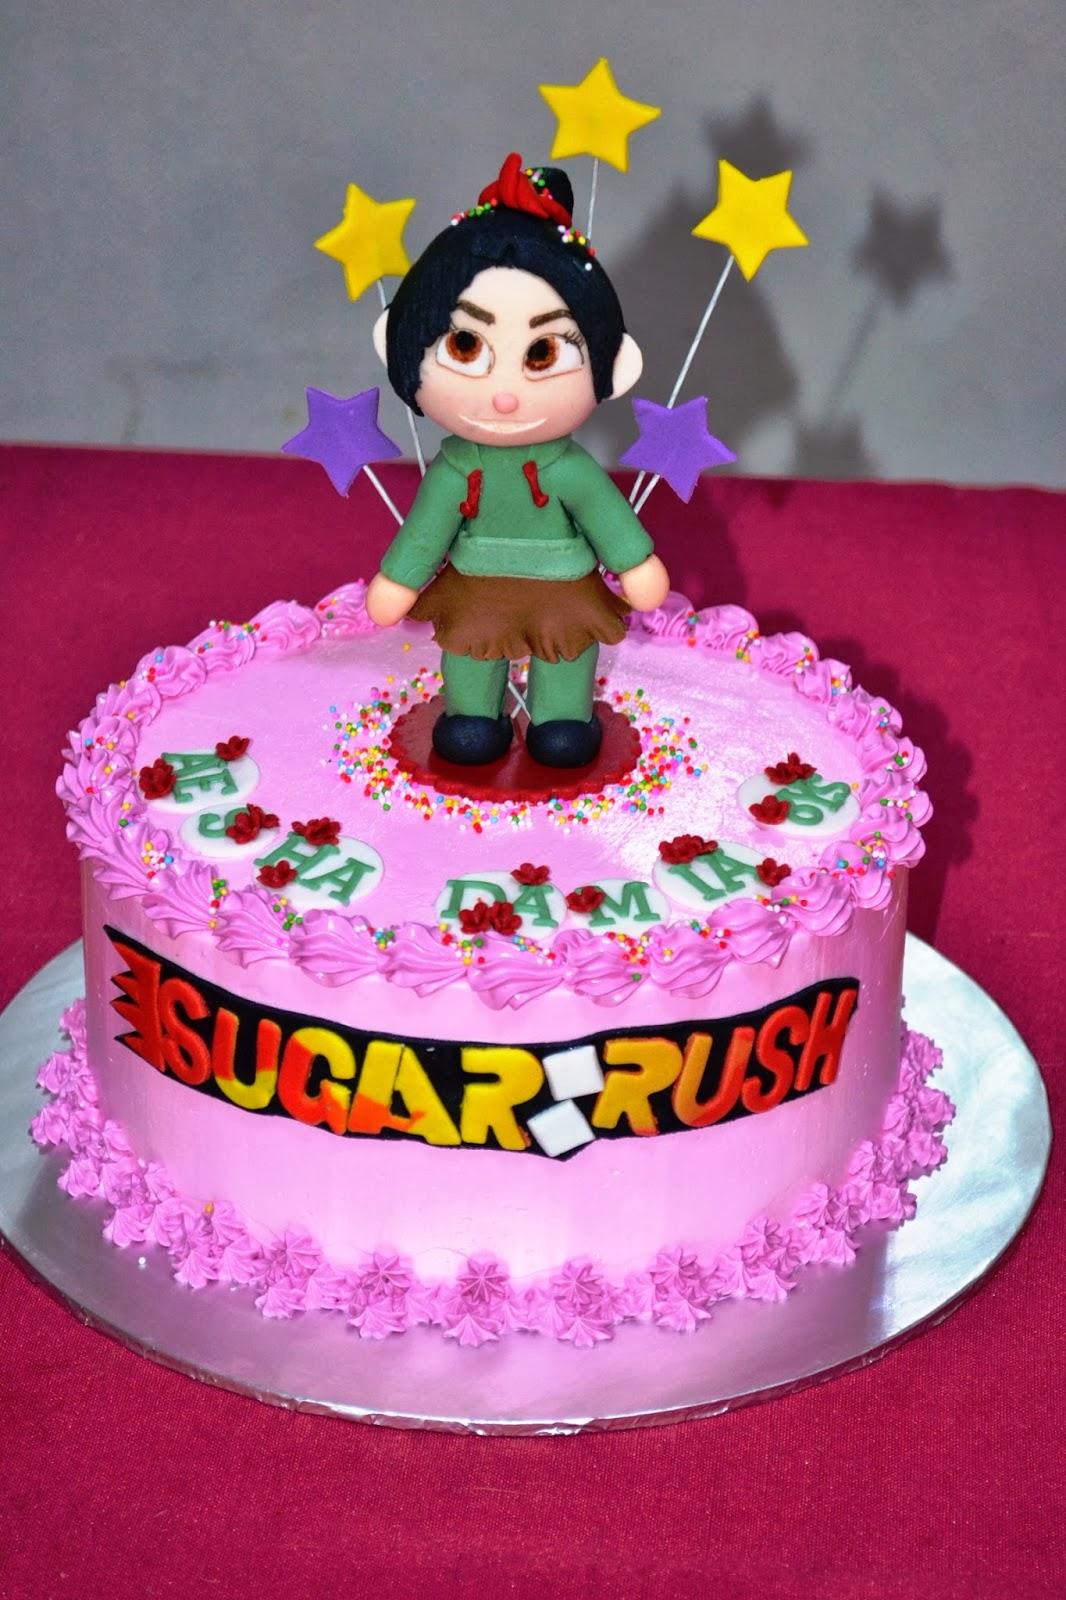 MyPu3 Cake House: Wreck it Ralph Cake